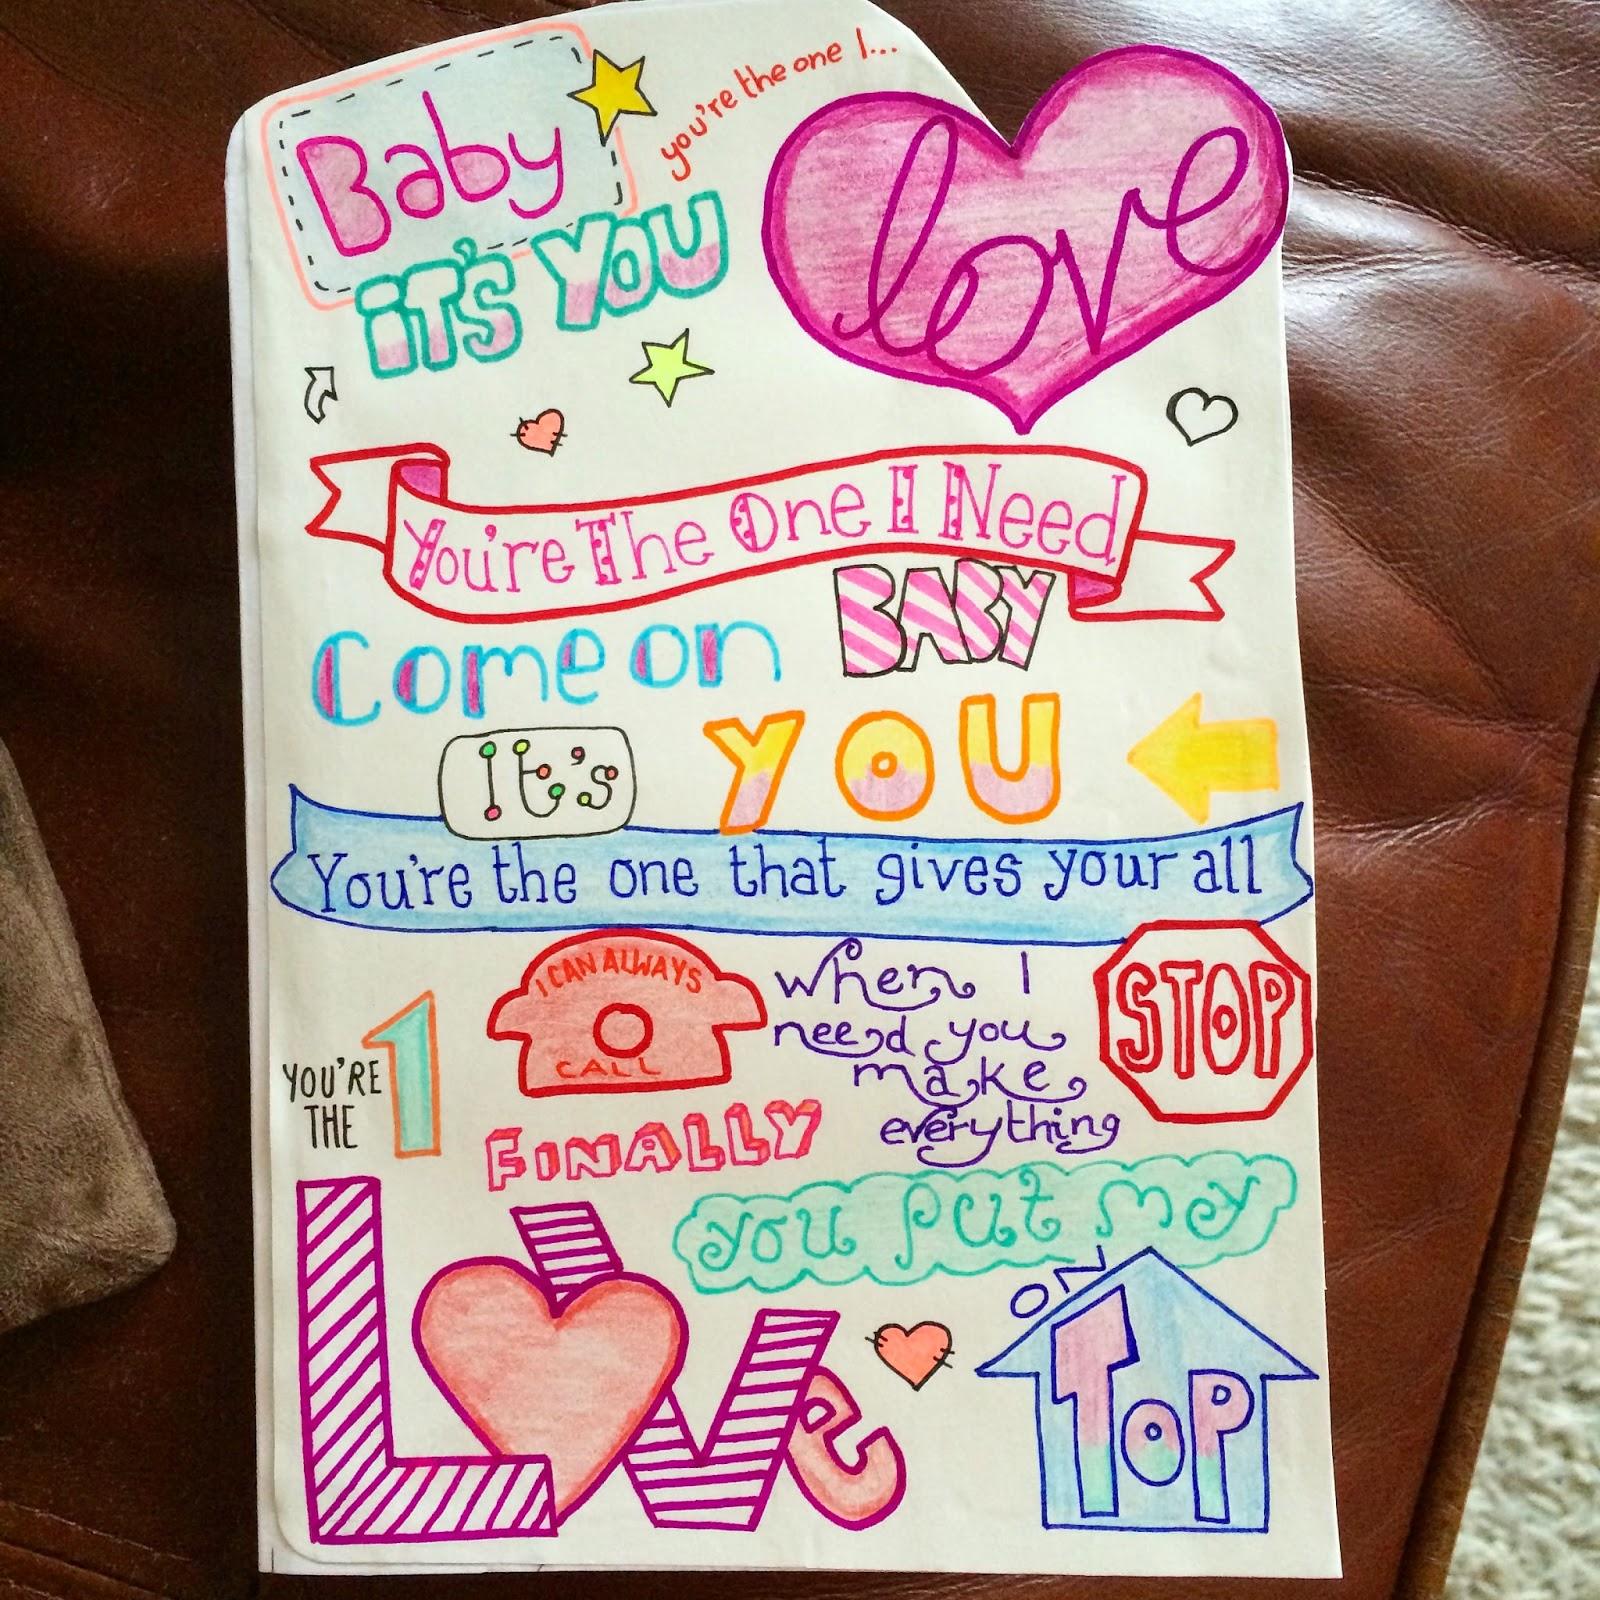 beyonce-lyrics-valentines-card-love-on-top